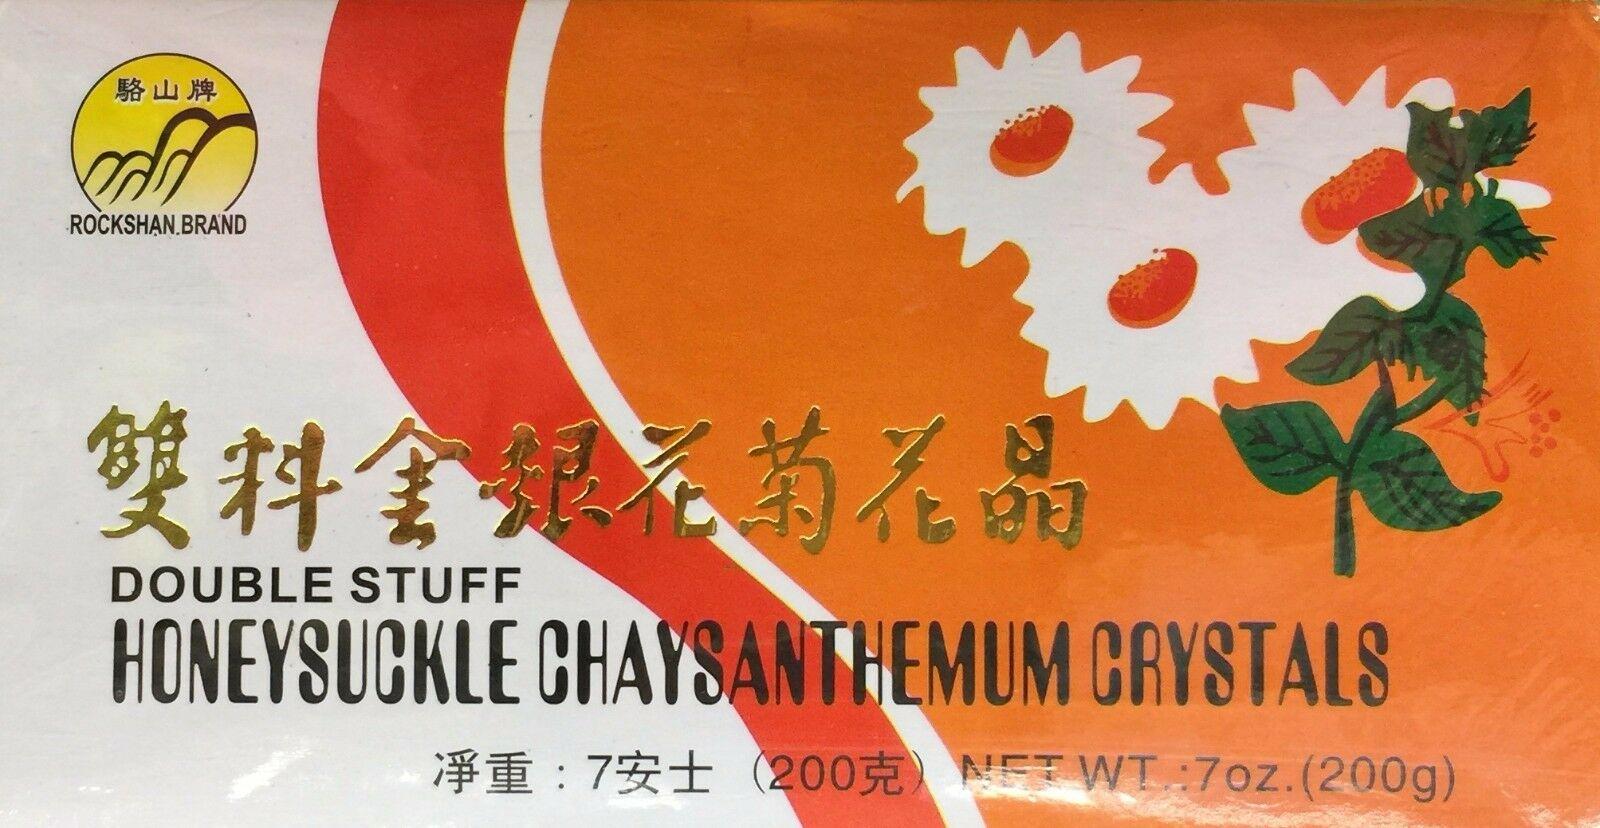 ROCKSHAN Double Stuff Honeysuckle Chaysanthemum Crystals 7 OZ